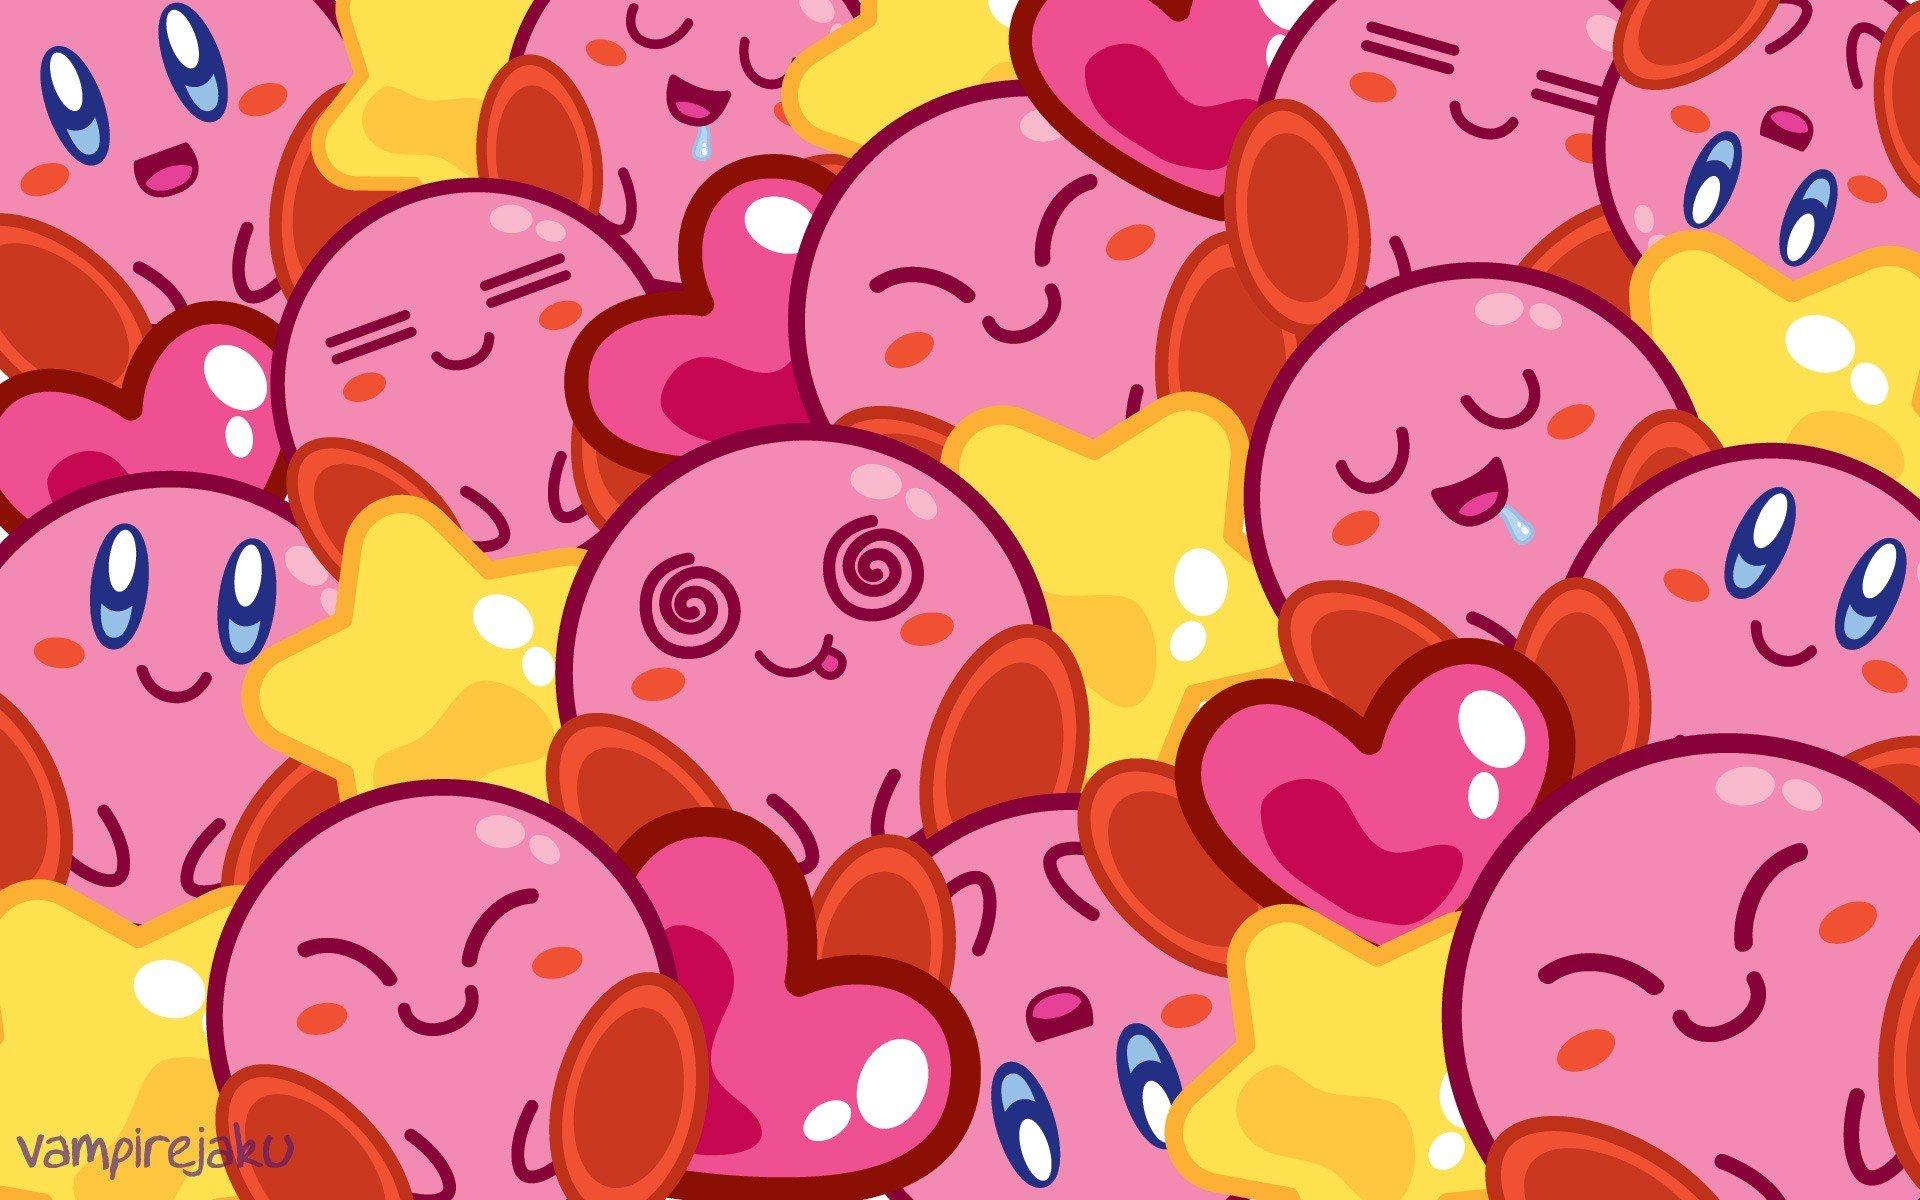 Kirby Wallpaper 1366x768: Nintendo Kirby Wallpaper Wallpaperup 1920x1200px